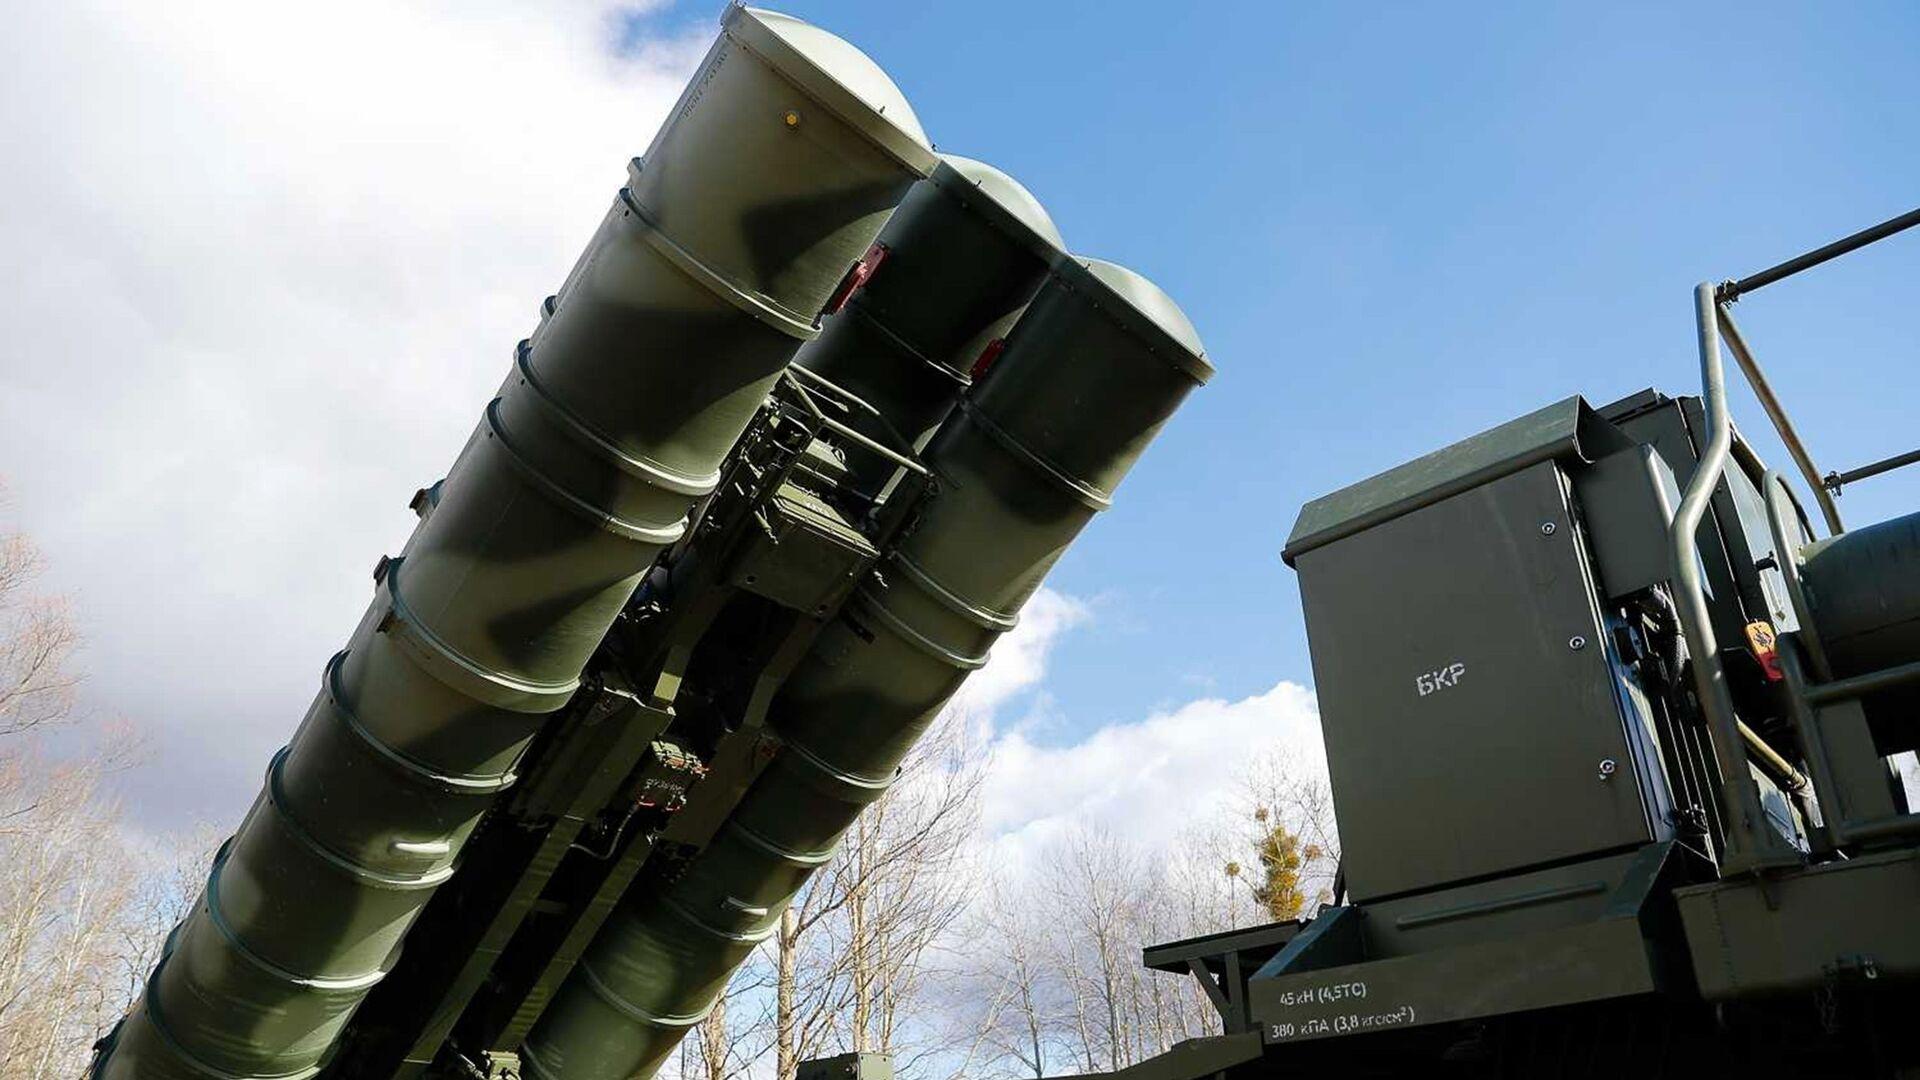 Sistema ruso de defensa antiaérea S-400 (archivo) - Sputnik Mundo, 1920, 30.06.2021